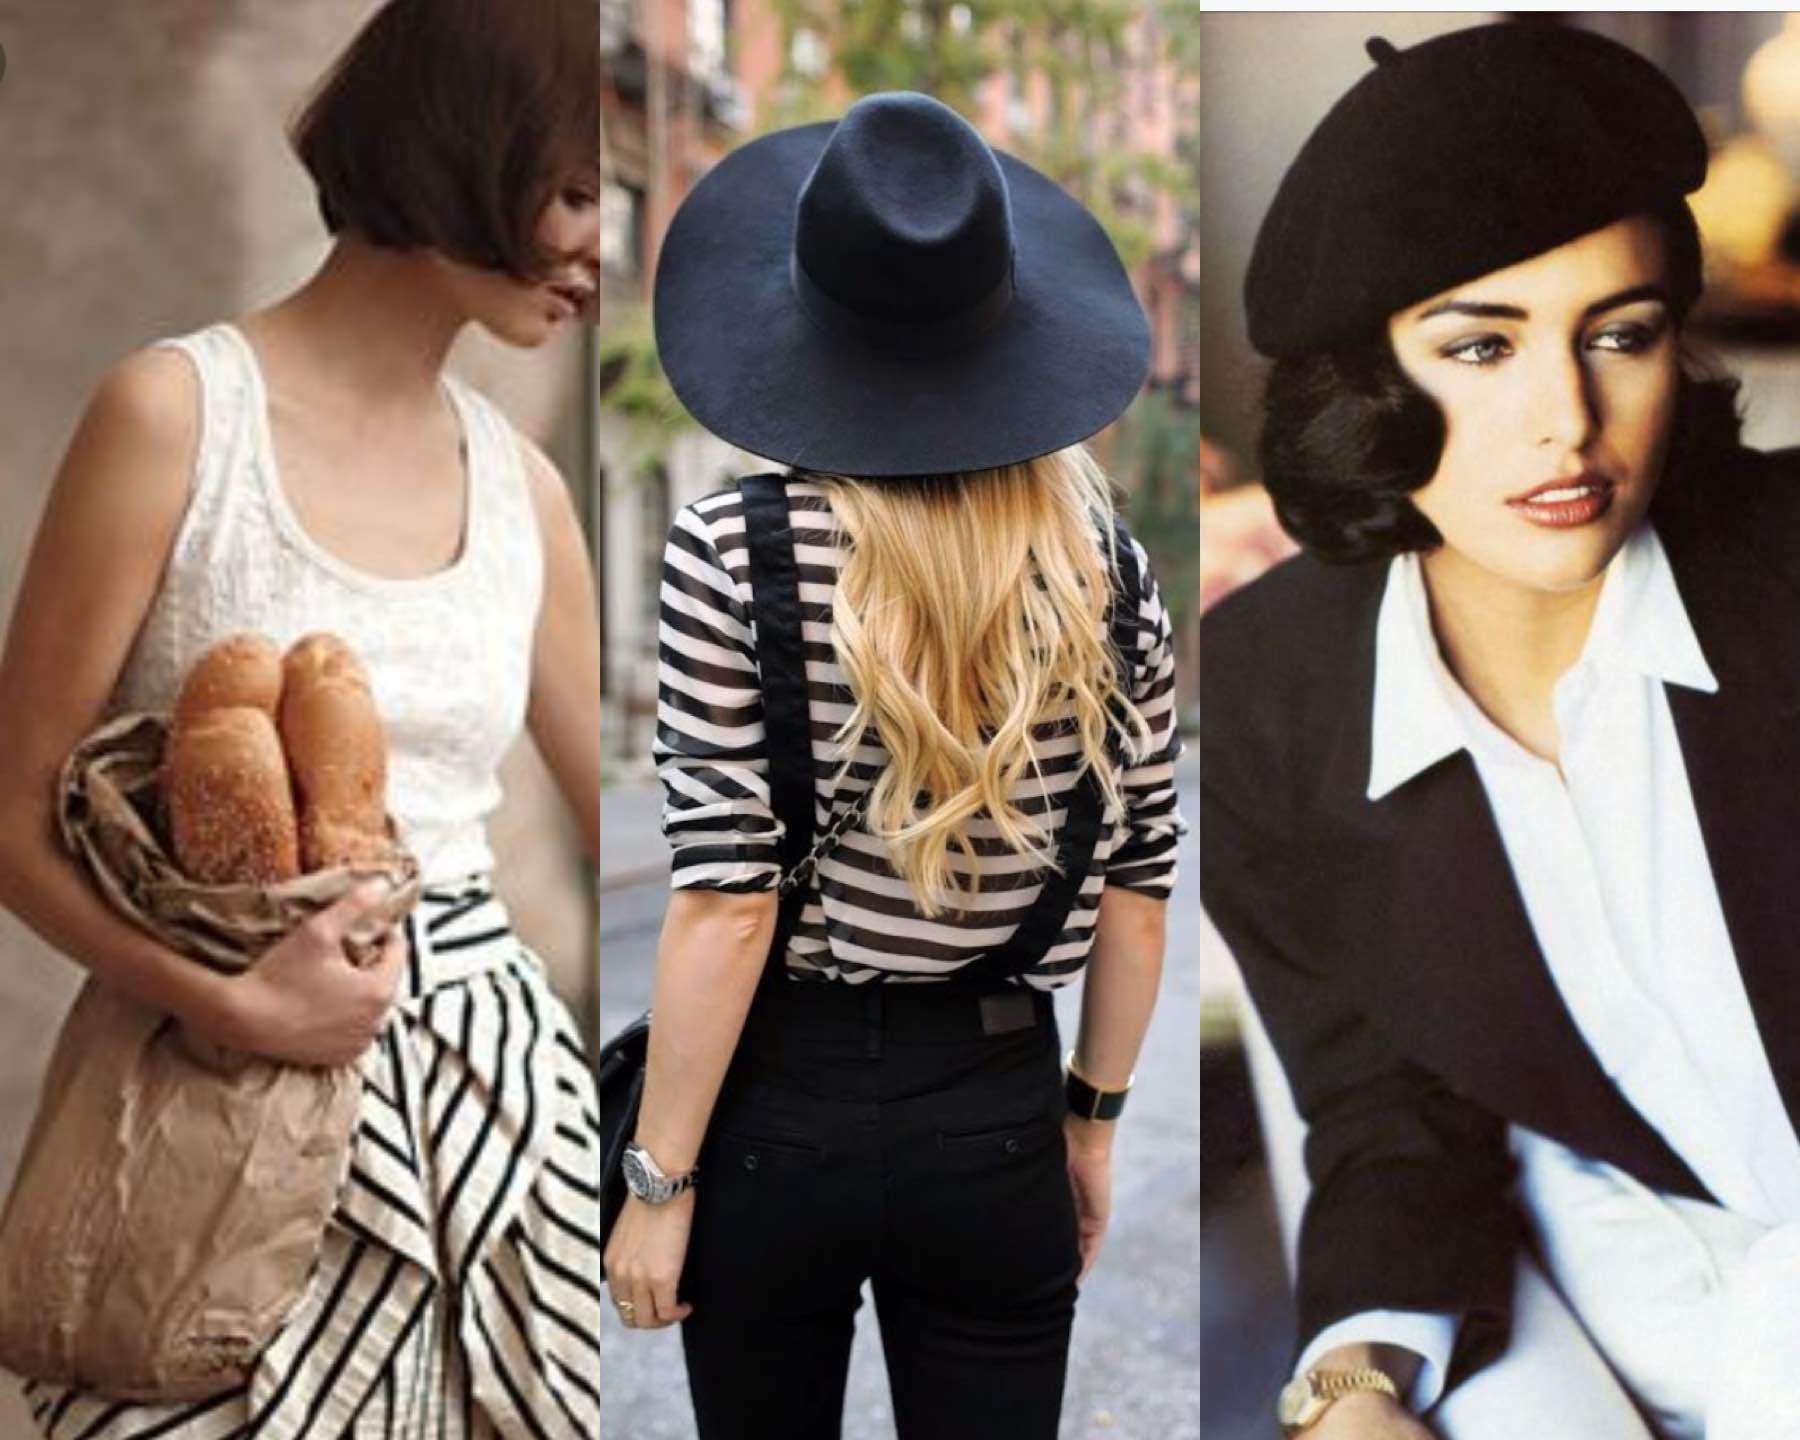 official photos 37d68 eded8 Moda e tendenze: lo stile Parisienne - Centralmente